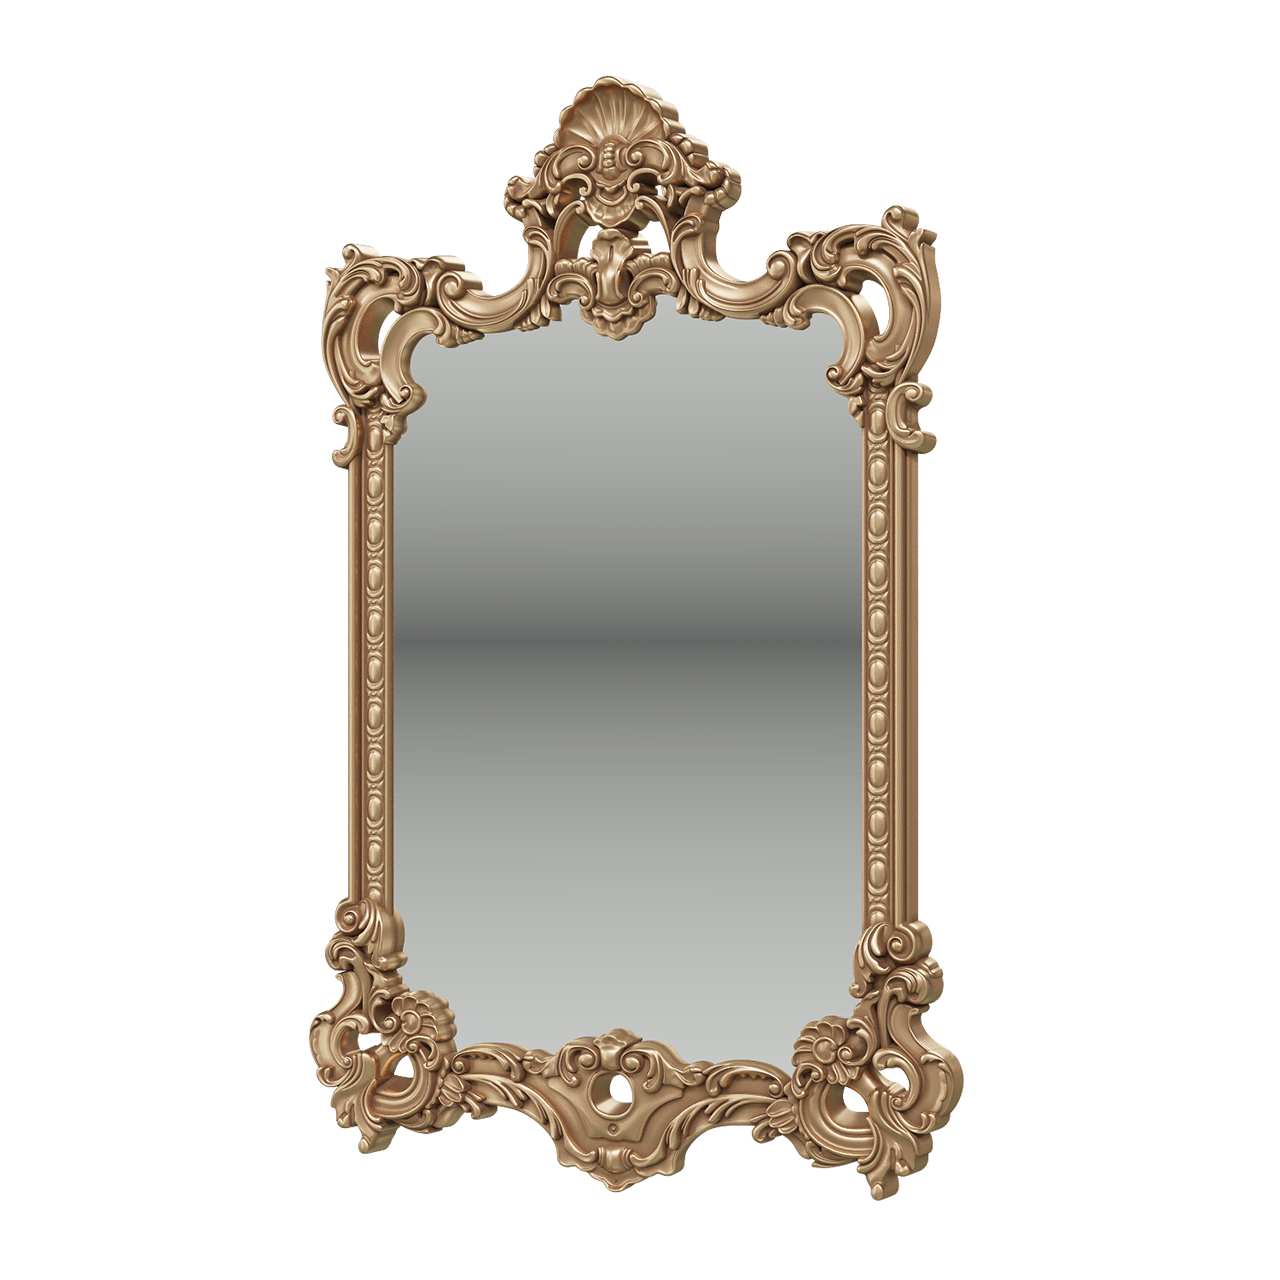 Зеркало Мэри-Мебель ЗК-02 золото, 75х8х118 см фото